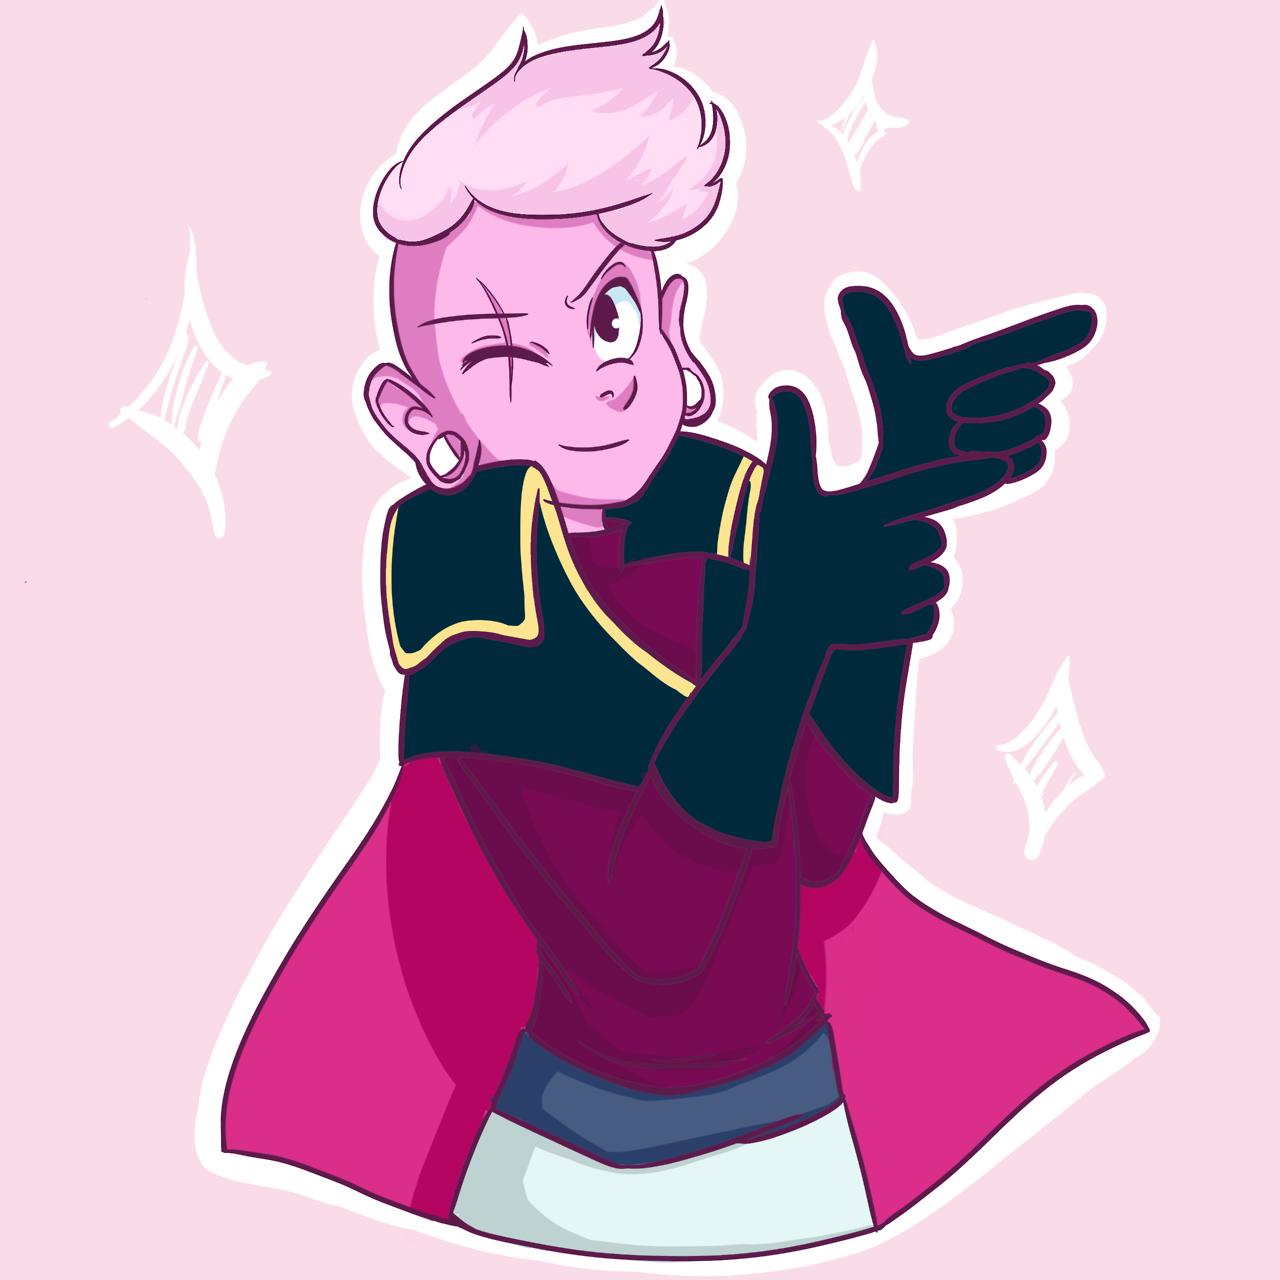 Captain Lars